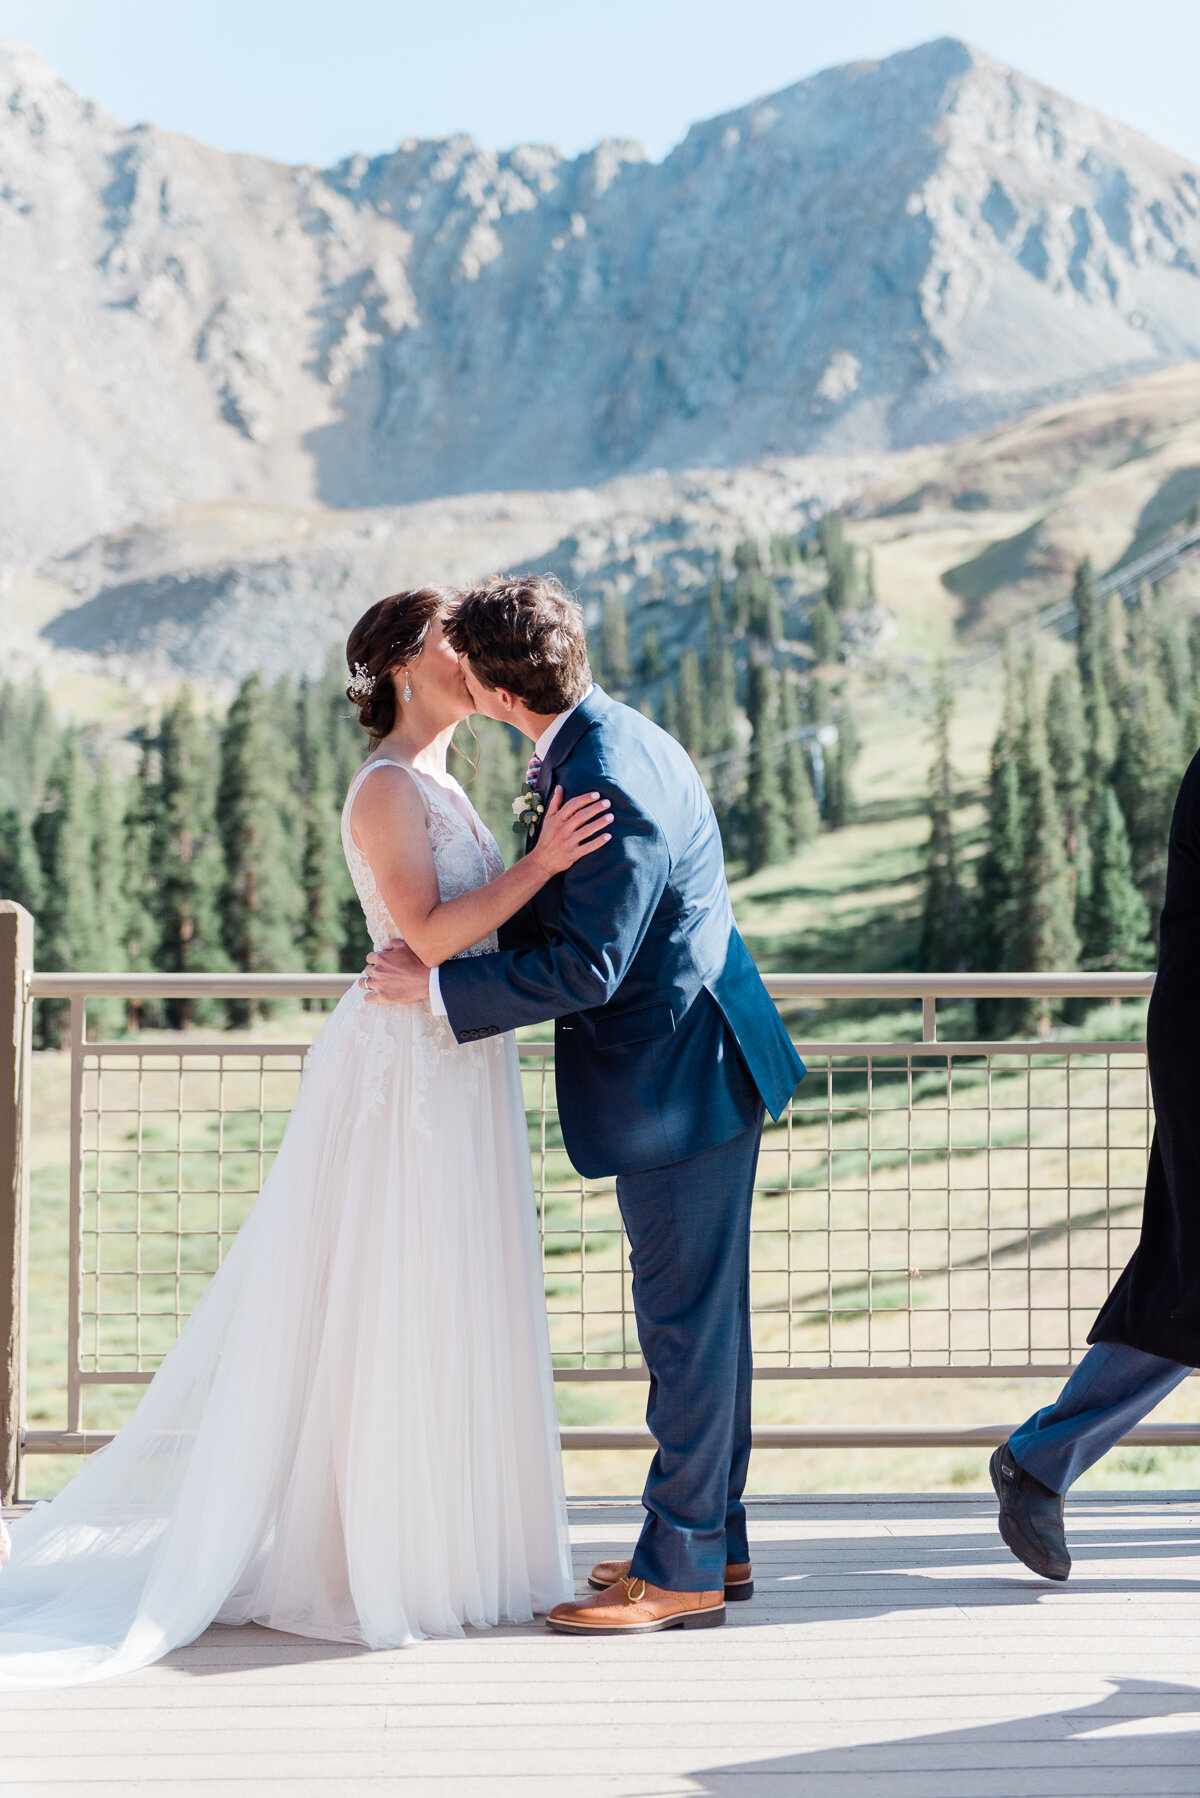 AshleighMillerPhotography-Wedding-Natalia-Matt-ArapahoeBasin-Colorado-29.jpg